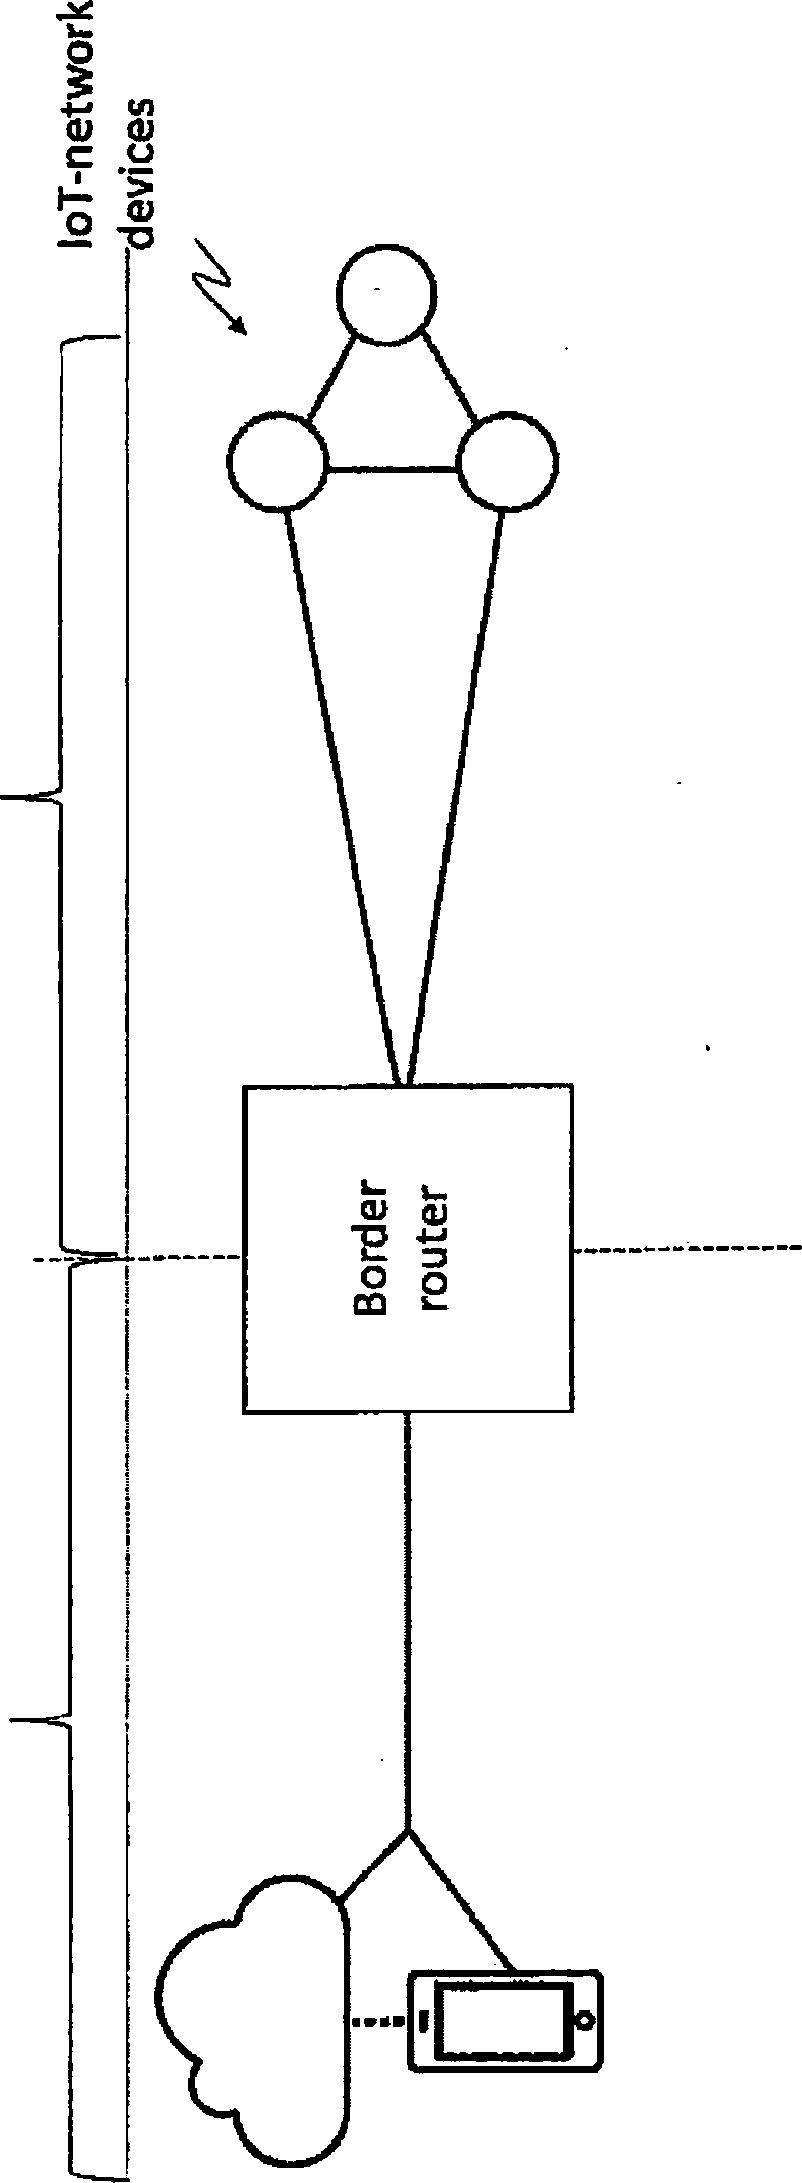 Figure GB2559310A_D0002